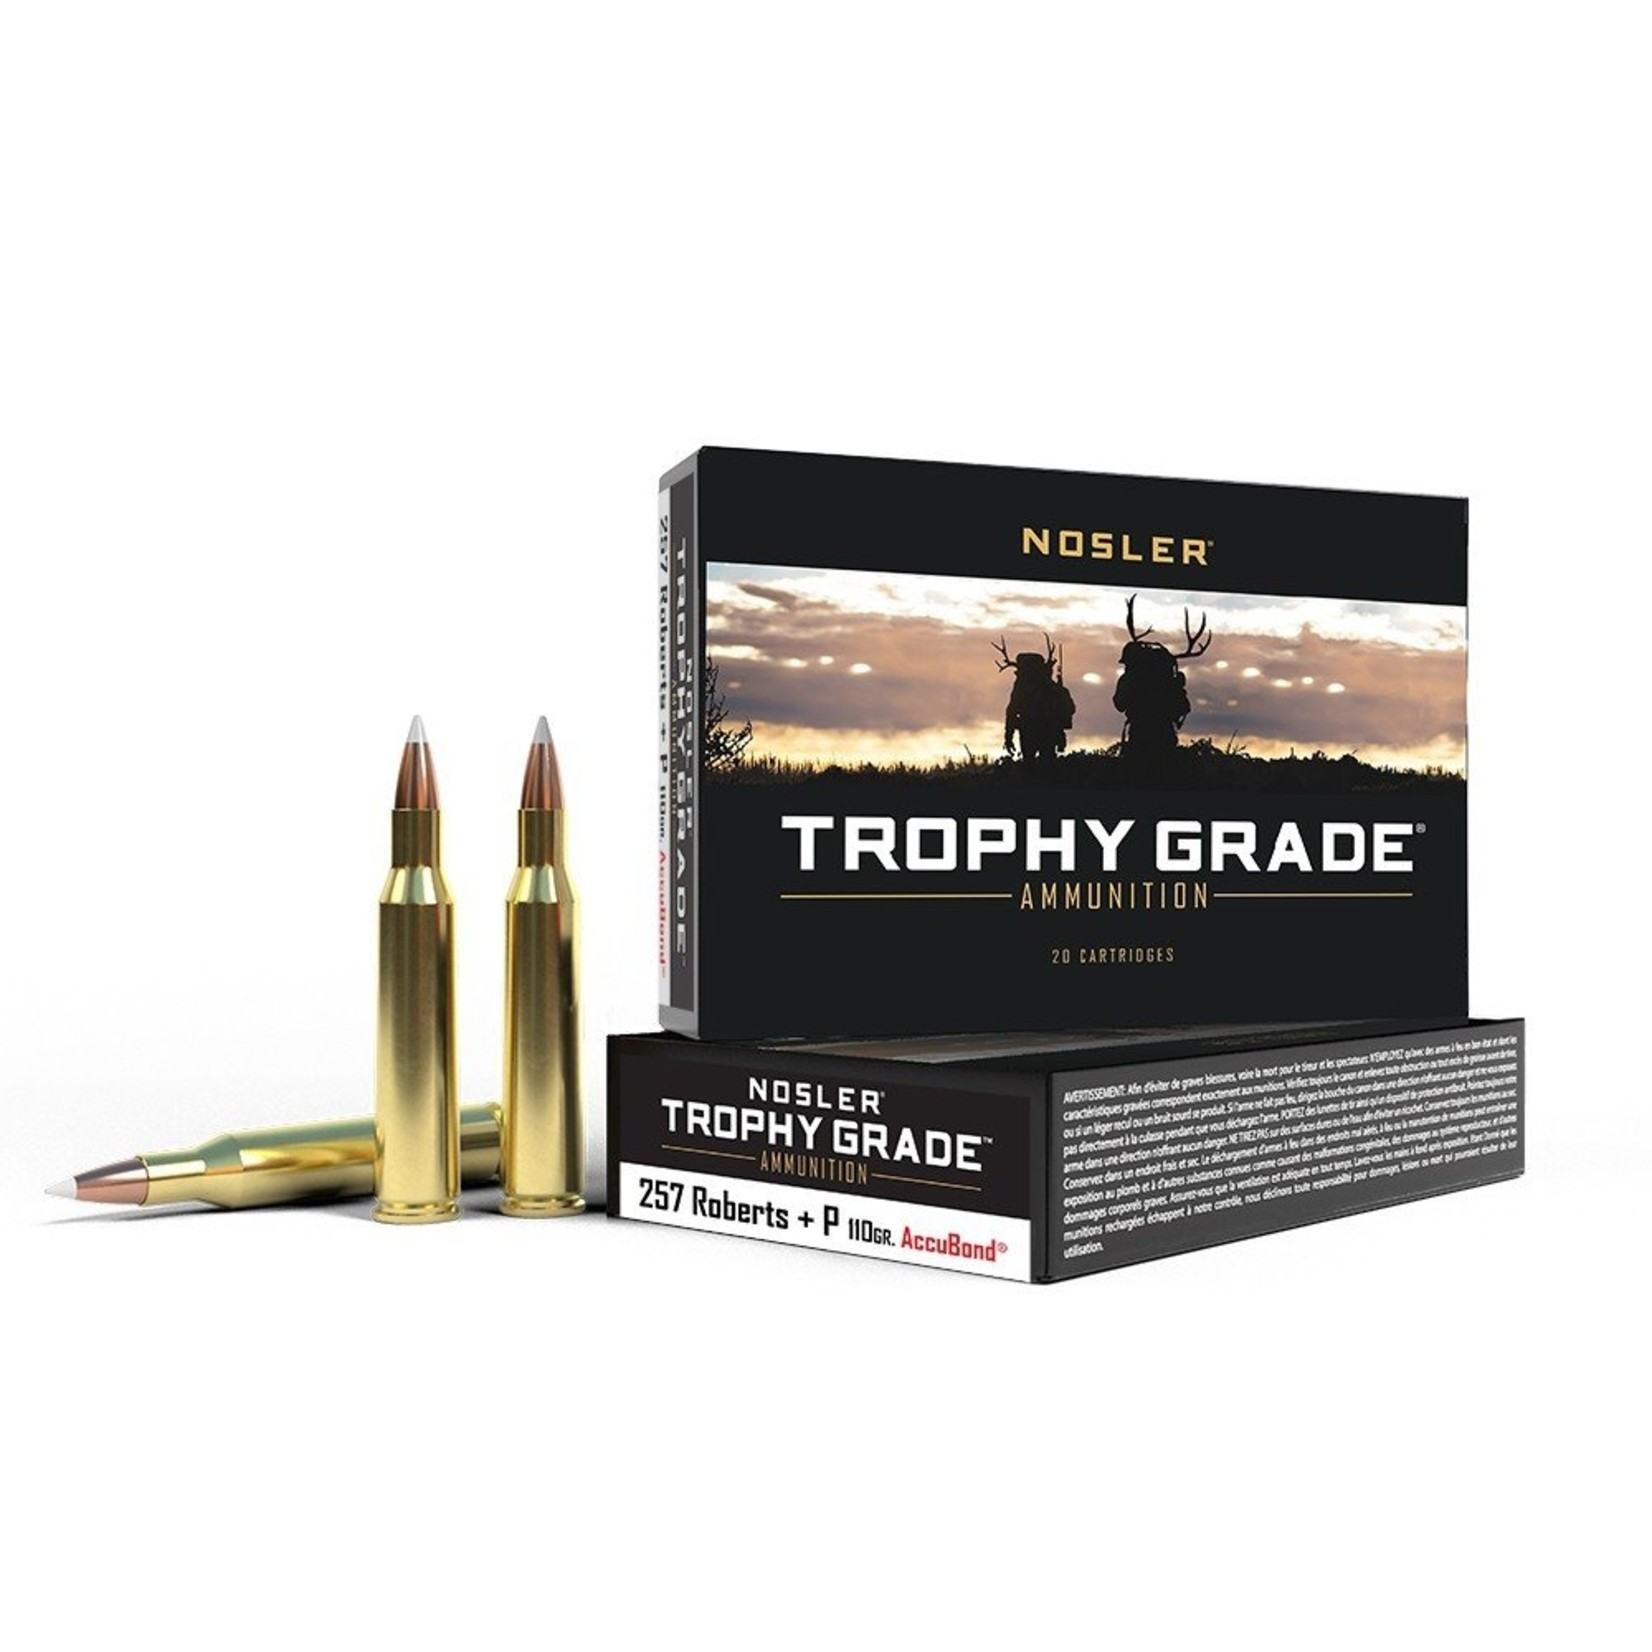 Nosler Trophy Grade Centerfire Ammunition .257 Roberts+P 110 Grain AccuBond